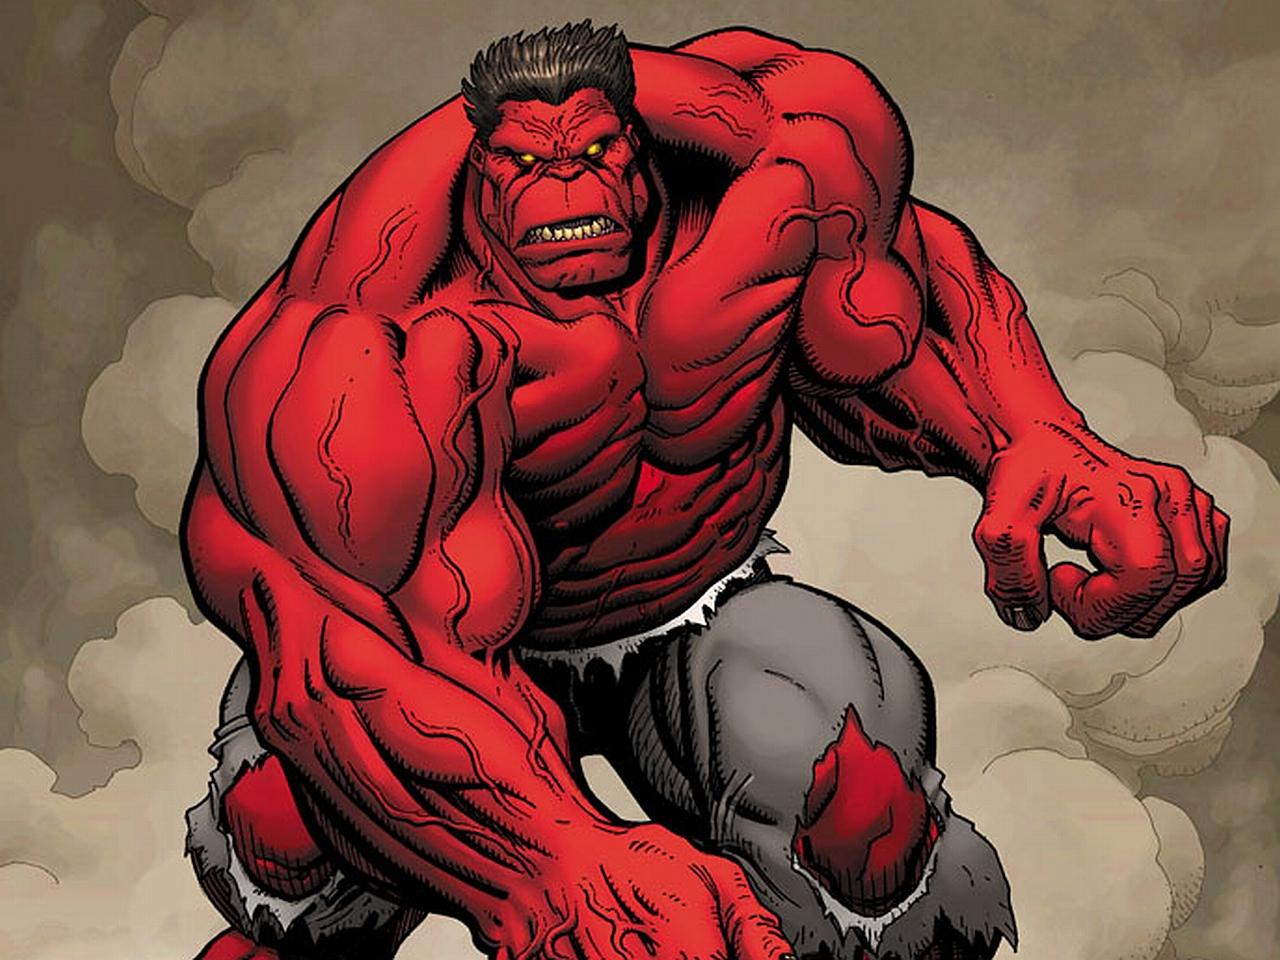 Red hulk wallpaper wallpapersafari - Pictures of red hulk ...